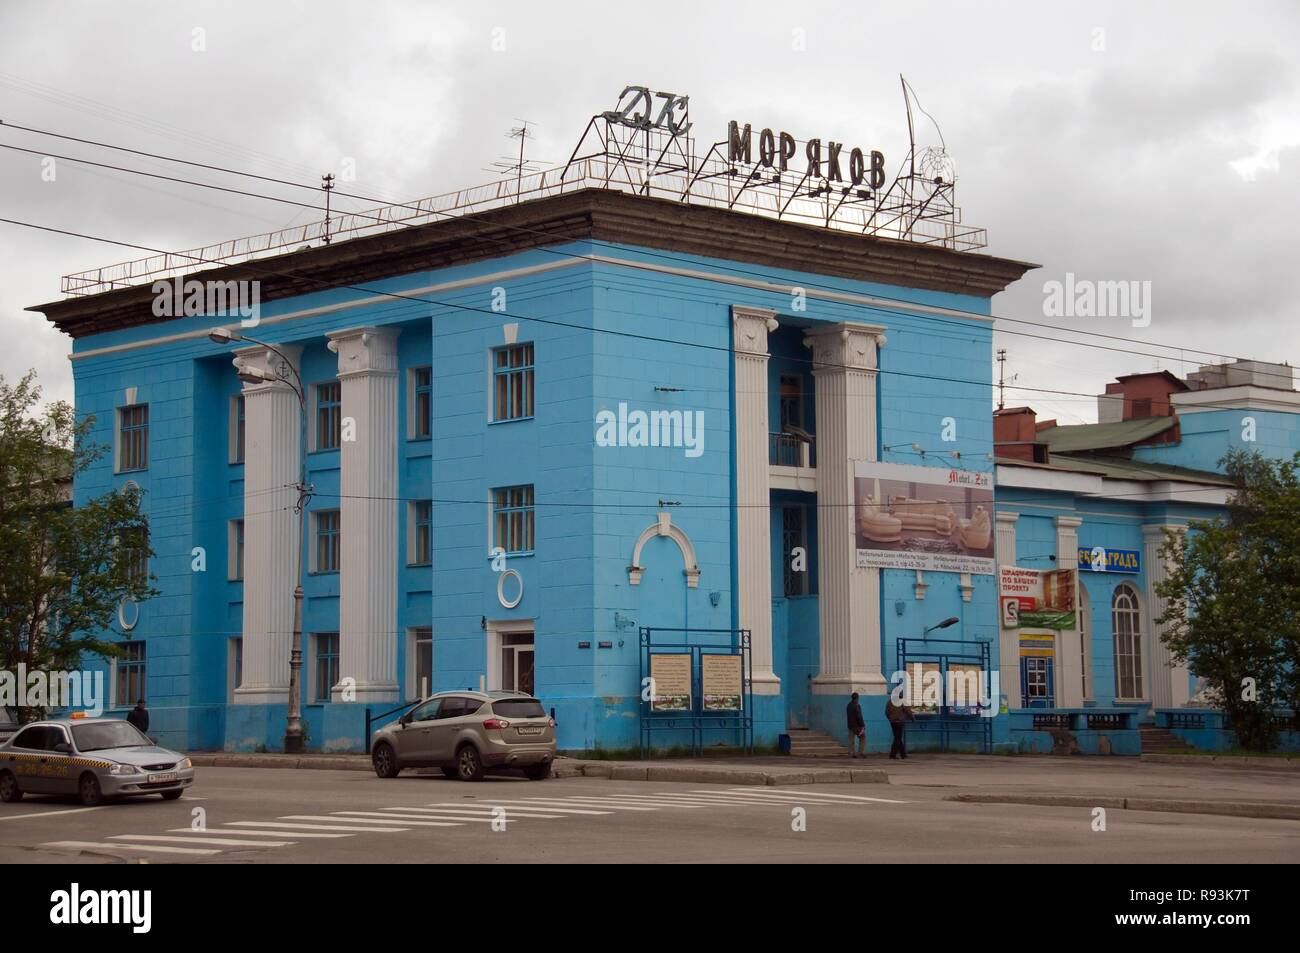 Historical house, Murmansk, Kola Peninsula, Arctic, Russia, Murmansk, Russia - Stock Image